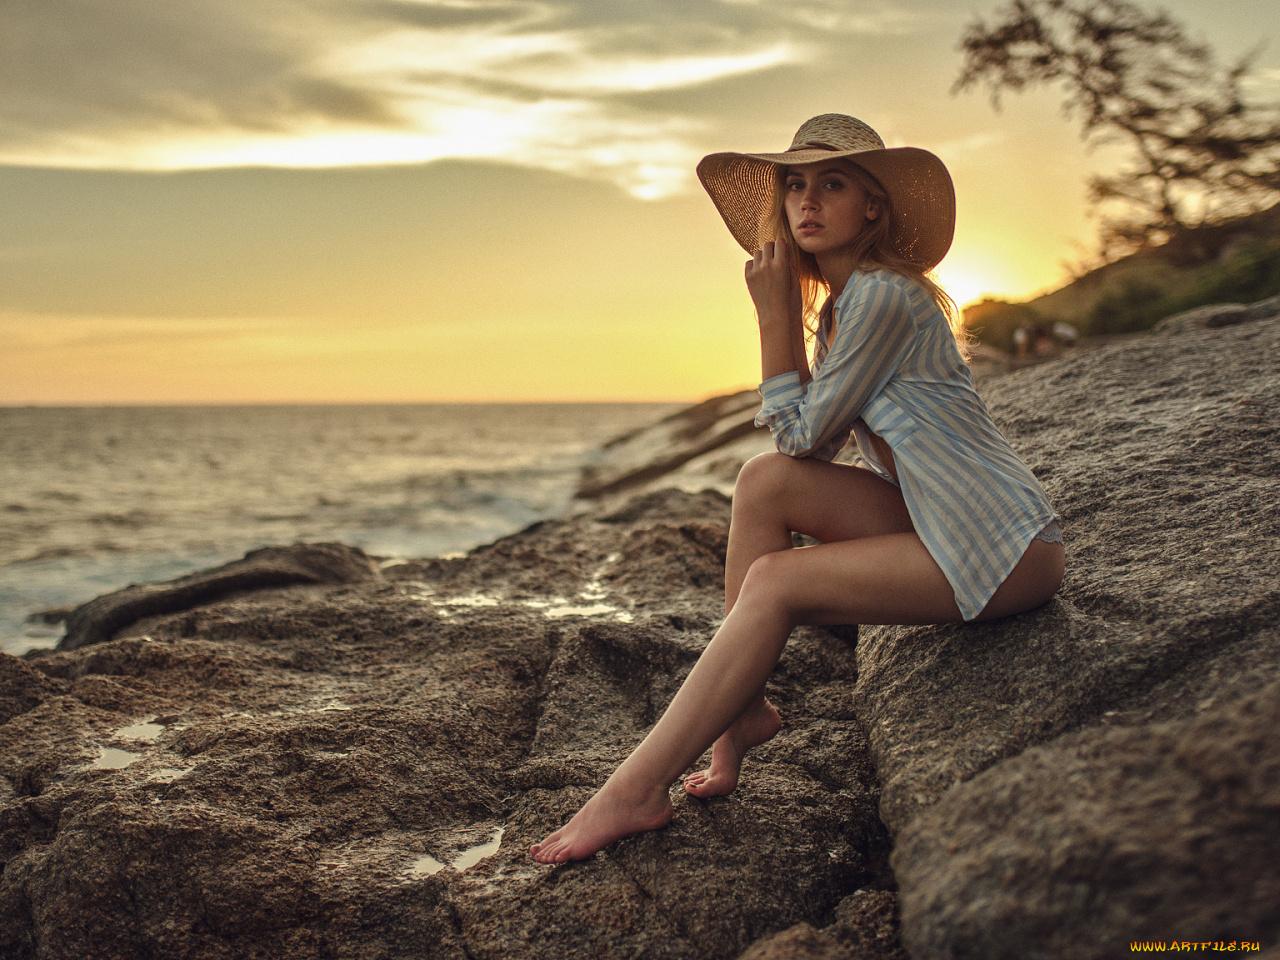 Фото девушек на фоне океана, Фото: Девушка на фоне океана 8 фотография